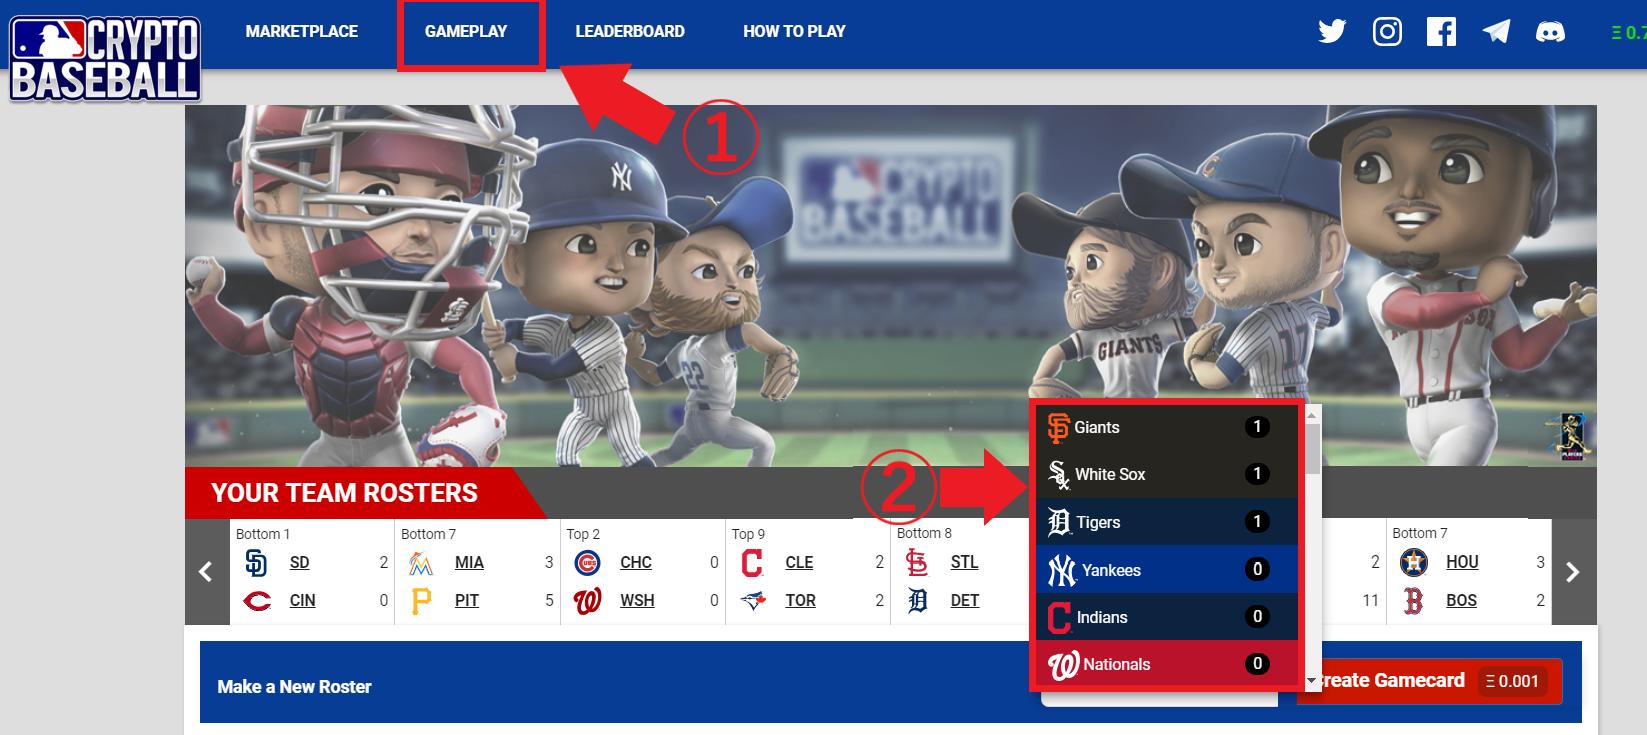 MLB CryptoBaseBall 遊び方 報酬 貰い方 プレイ方法